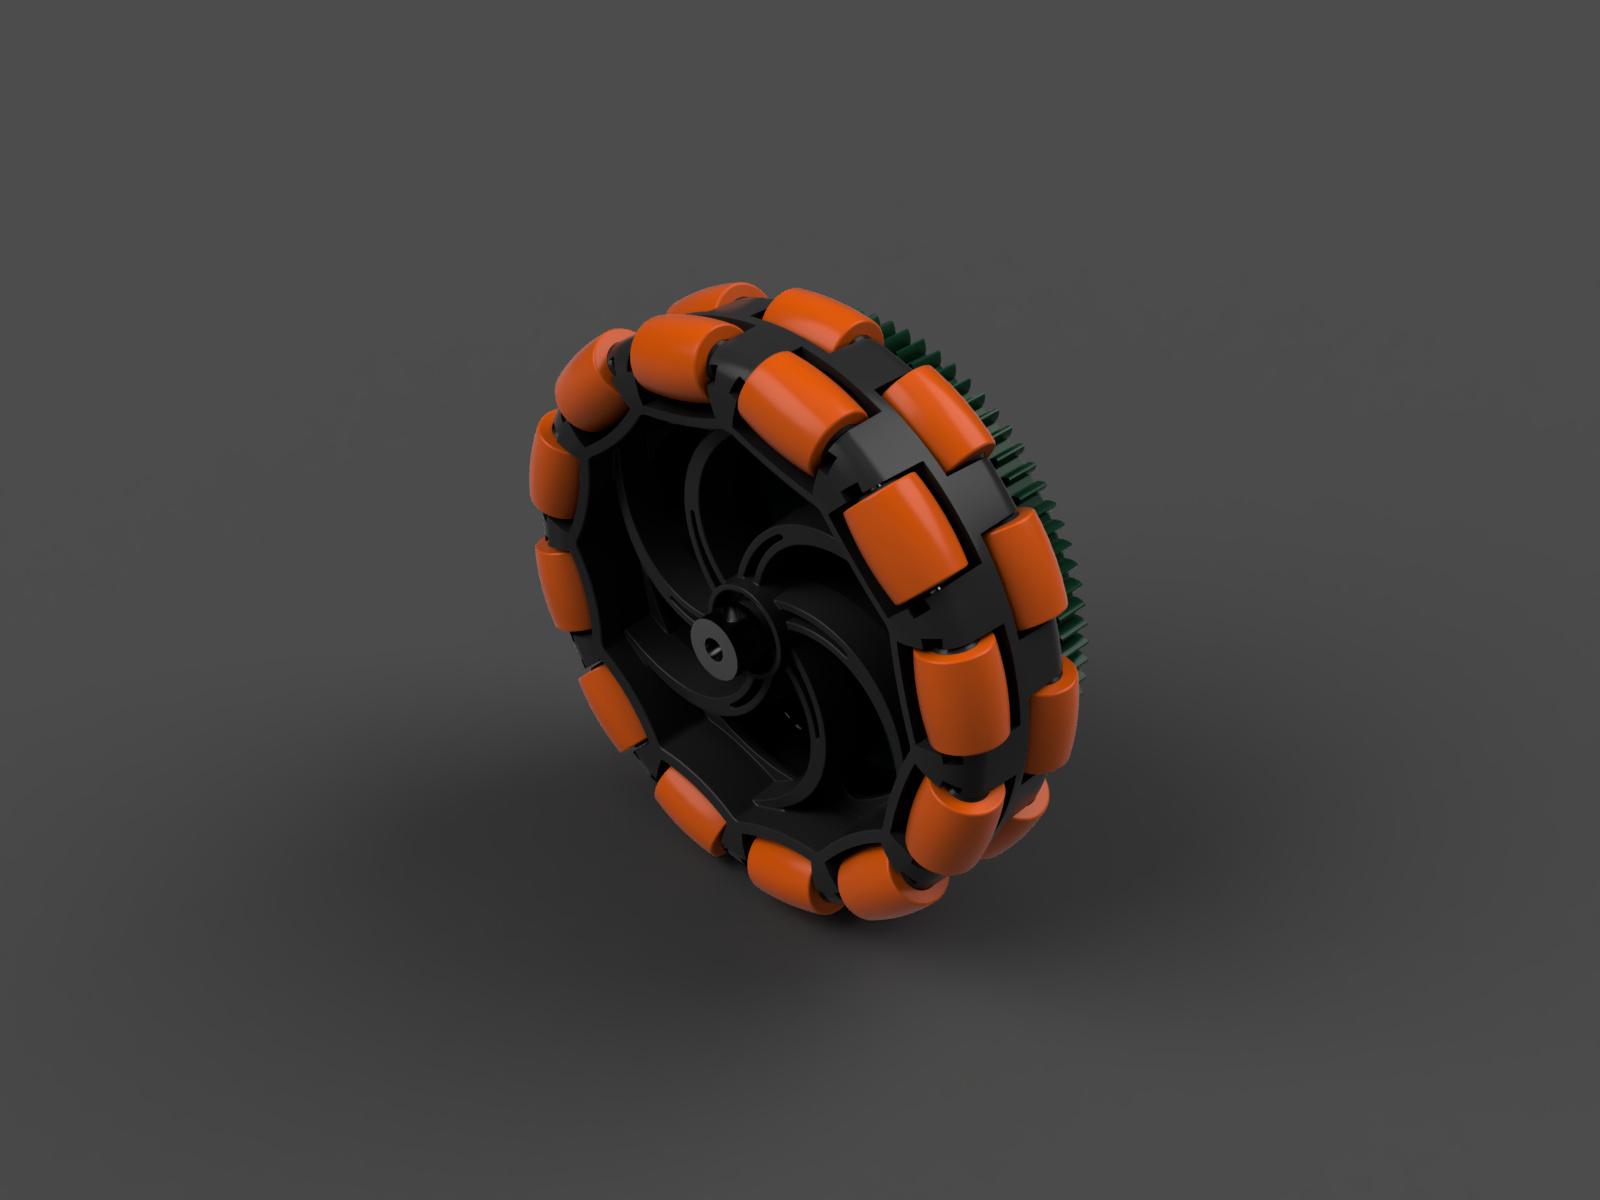 Wheelaxle_2020-Jun-27_10-19-31PM-000_CustomizedView26123194857_jpg